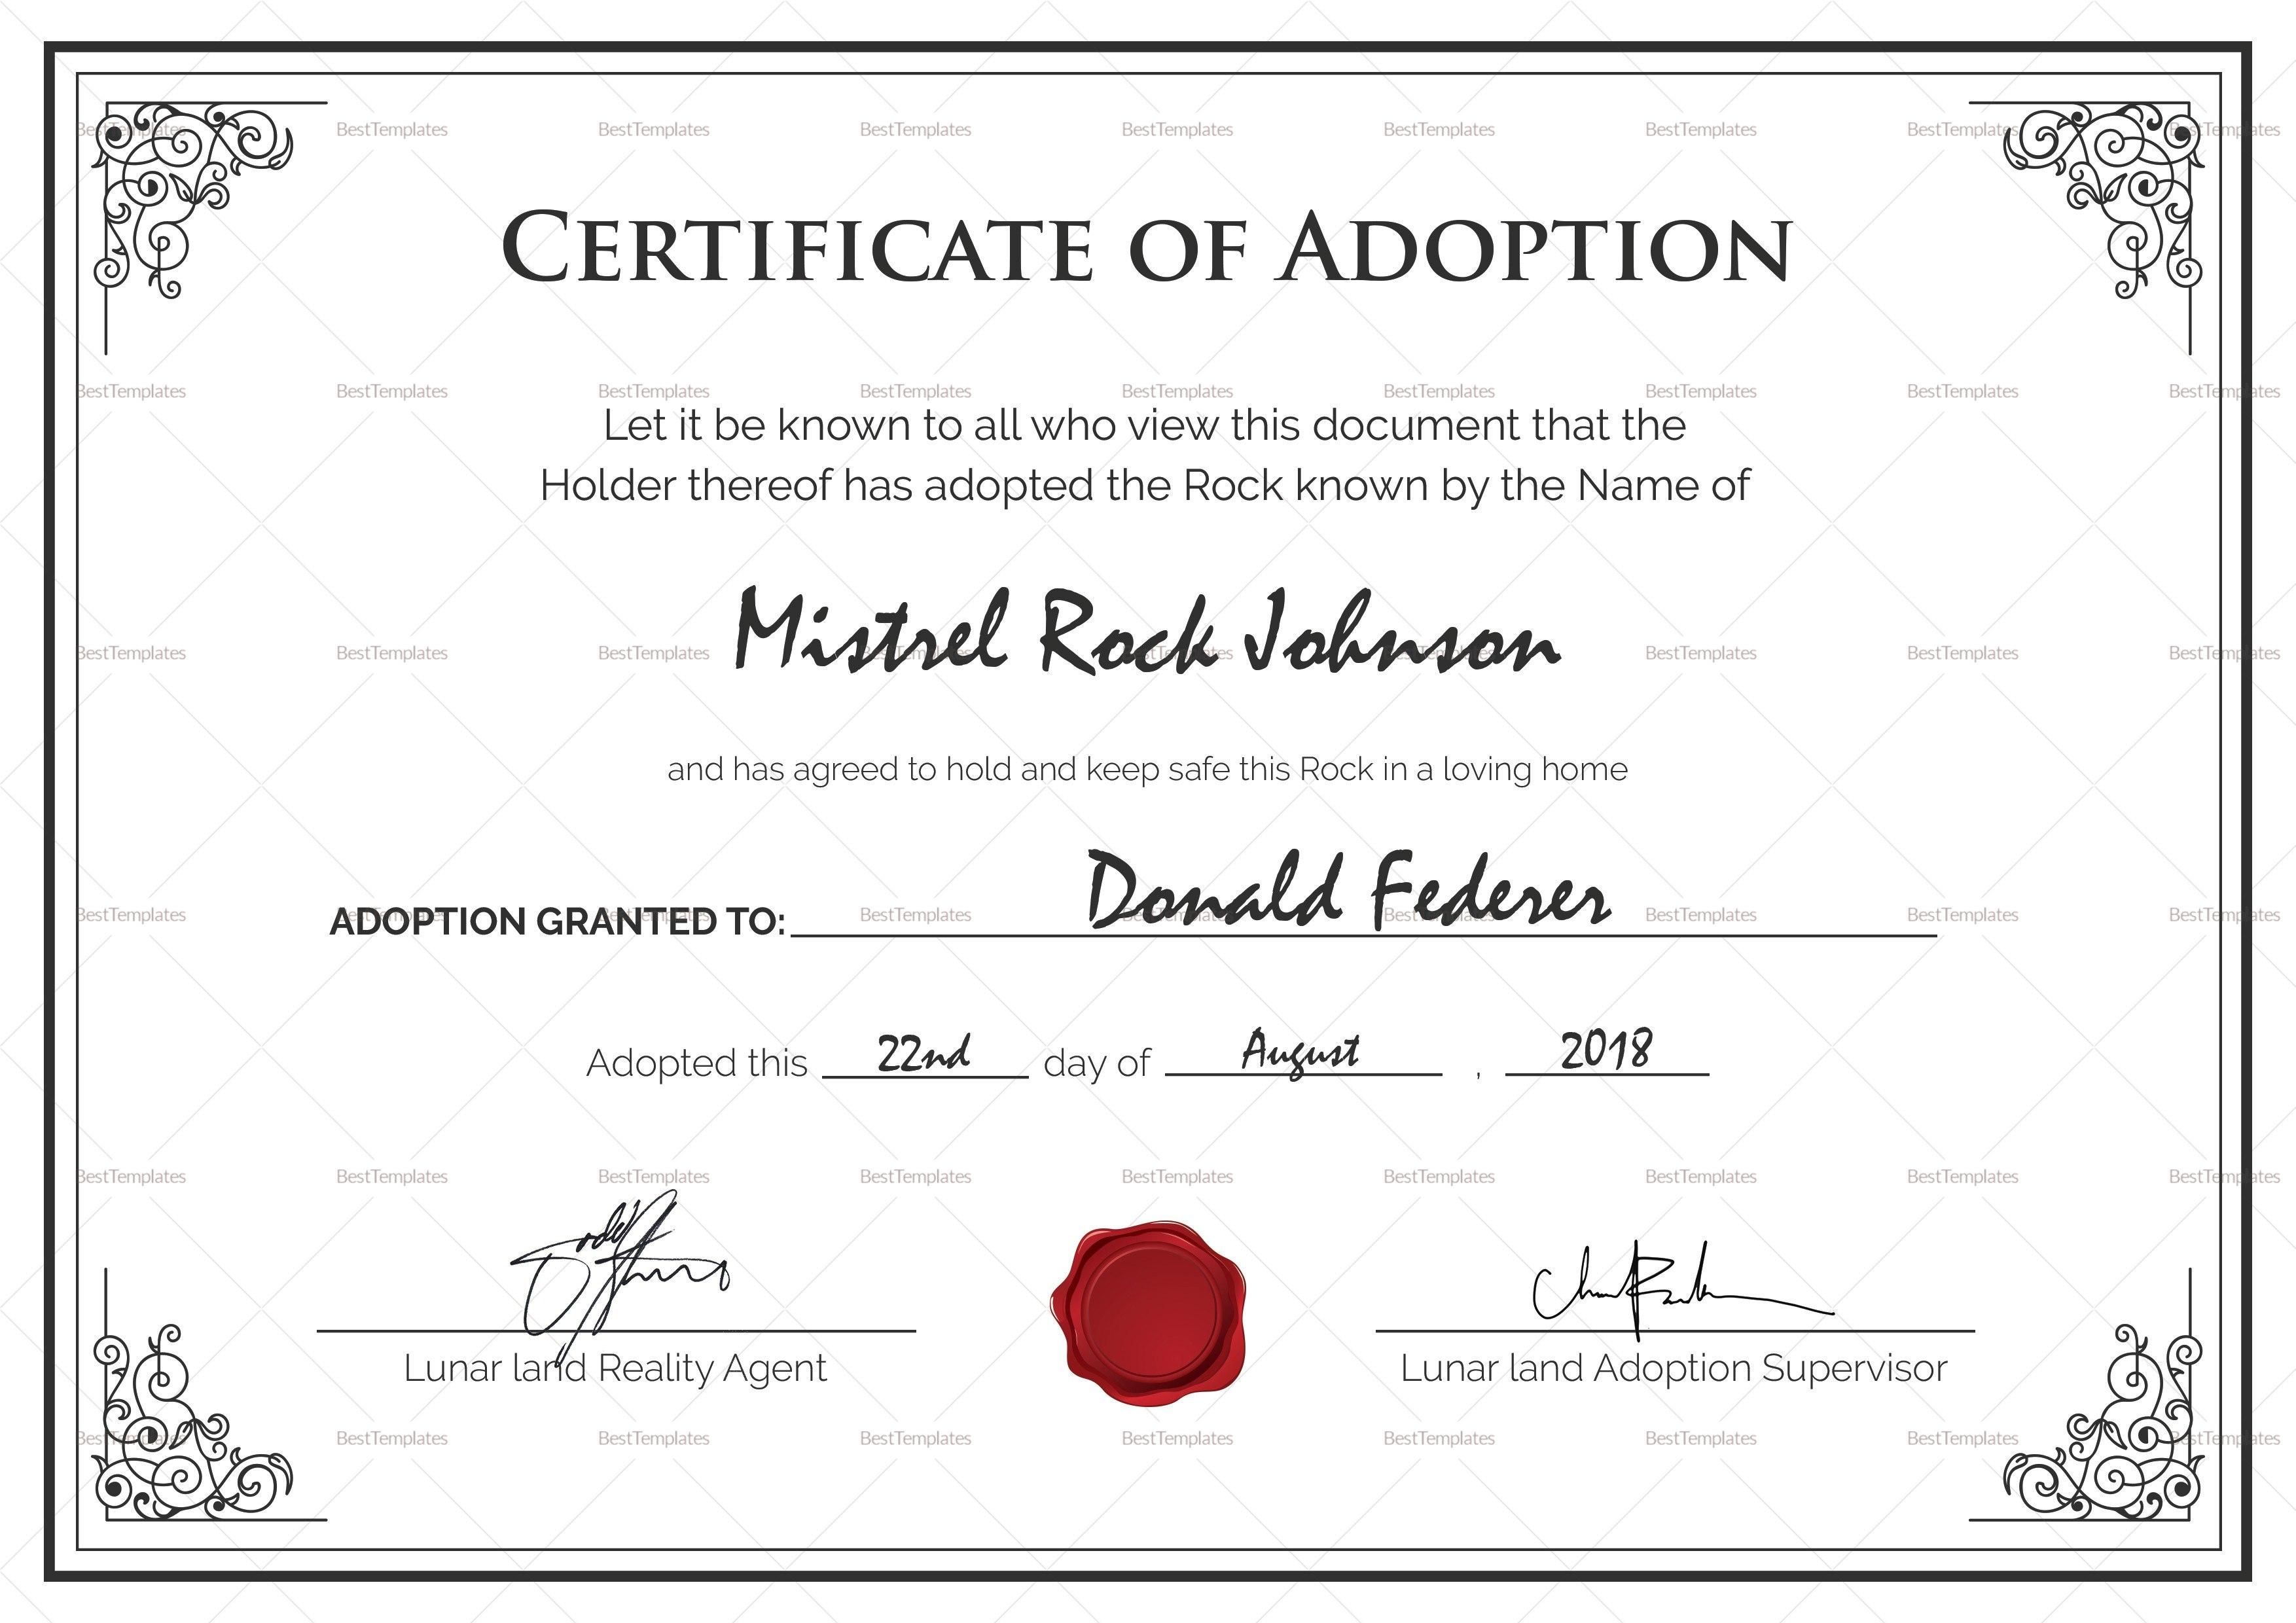 Adoption Certificate Template Best Birth Design In Psd Word Of Inside Adoption Certificate Template